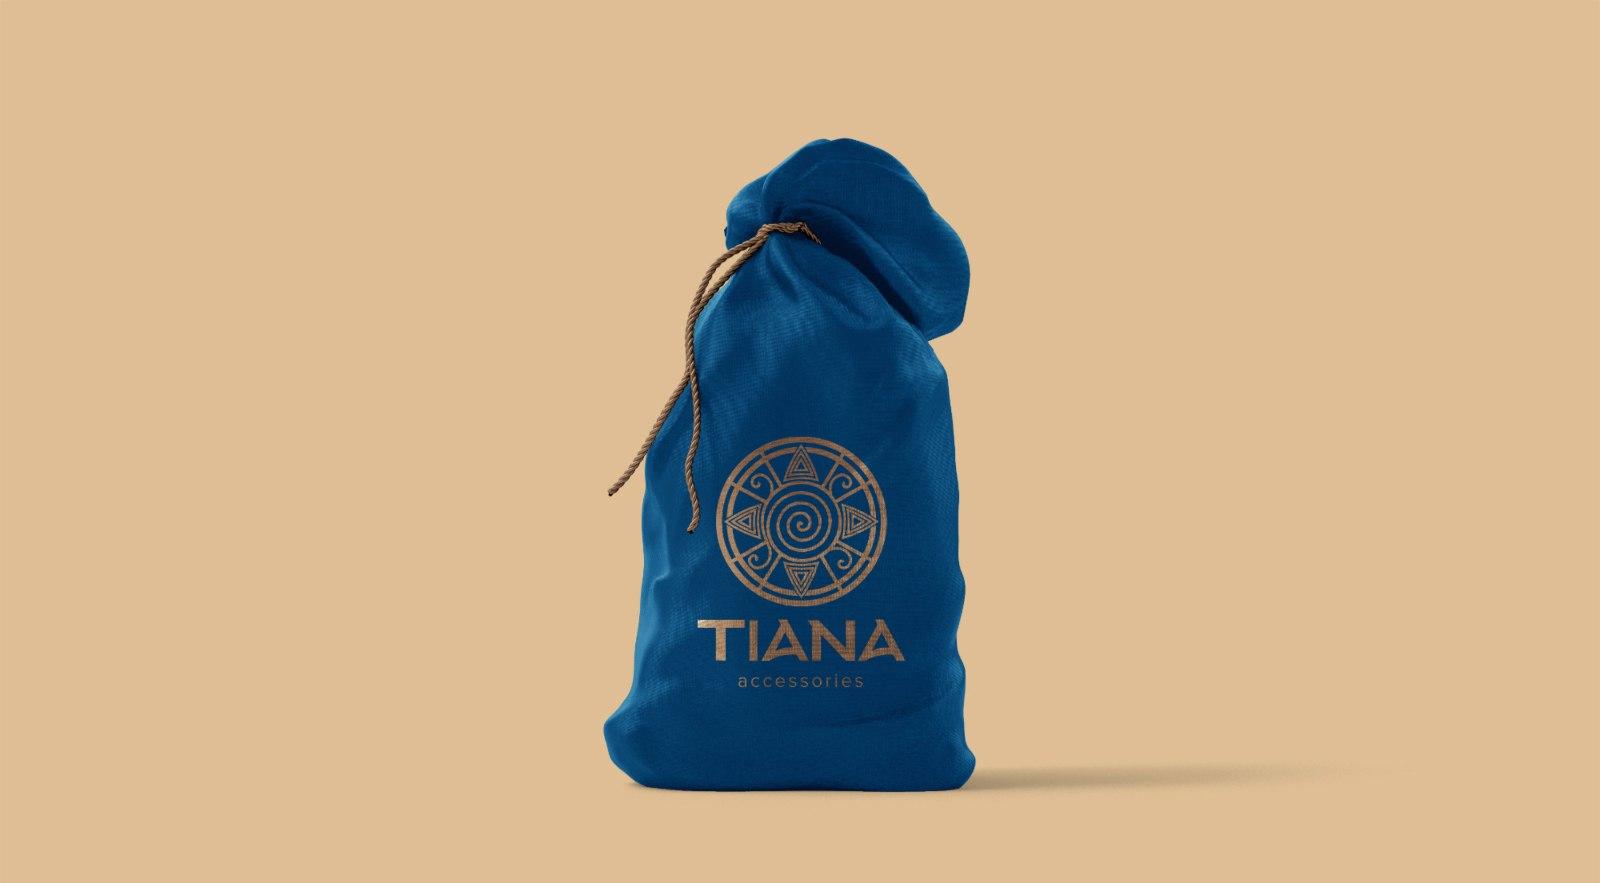 TIANA / Branding / 2017 Санто Доминго, республика Доминикана